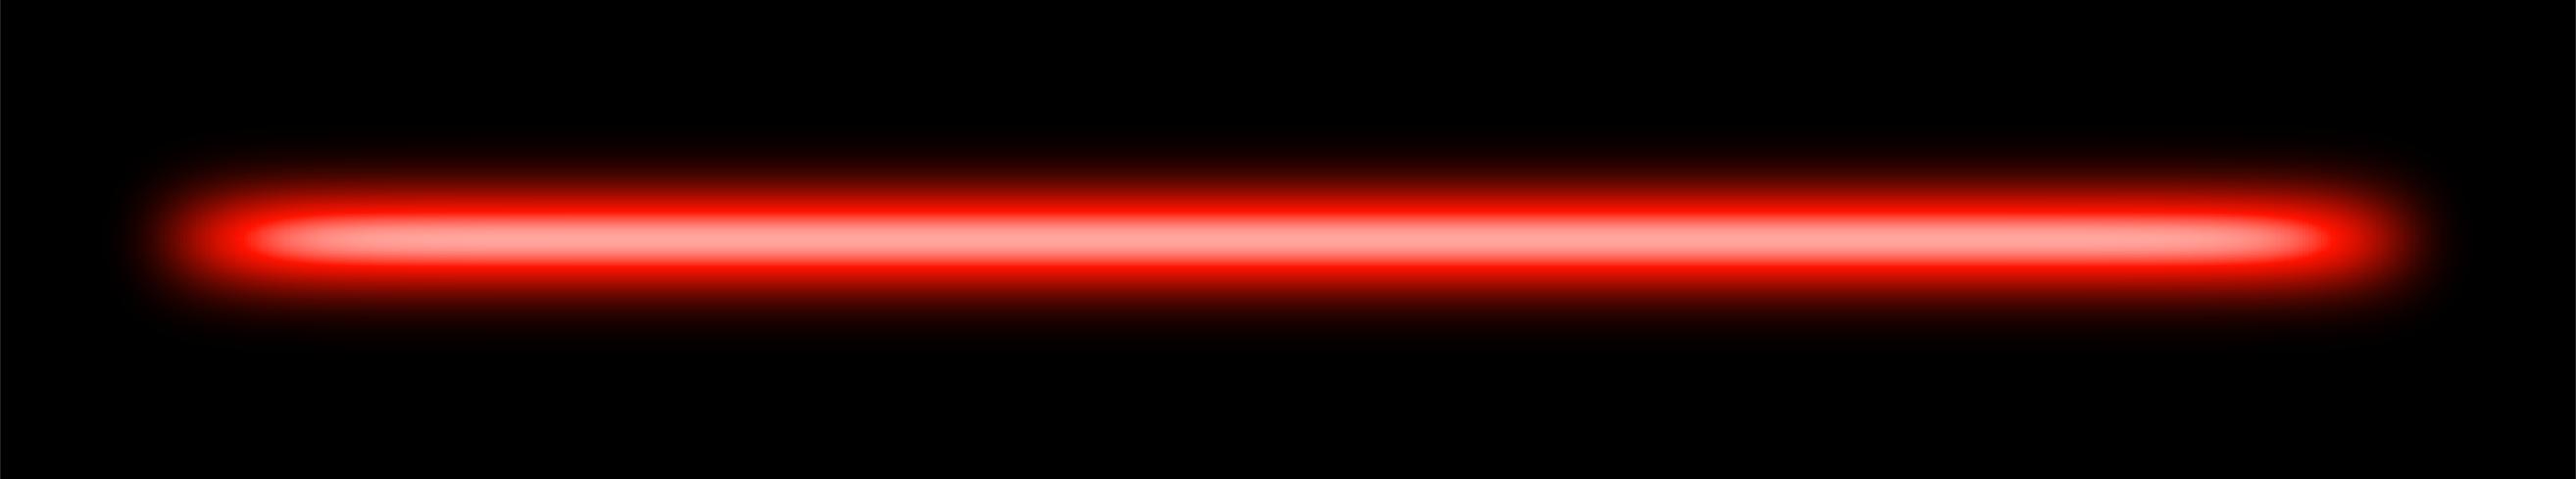 660 nm (red) uniform laser line